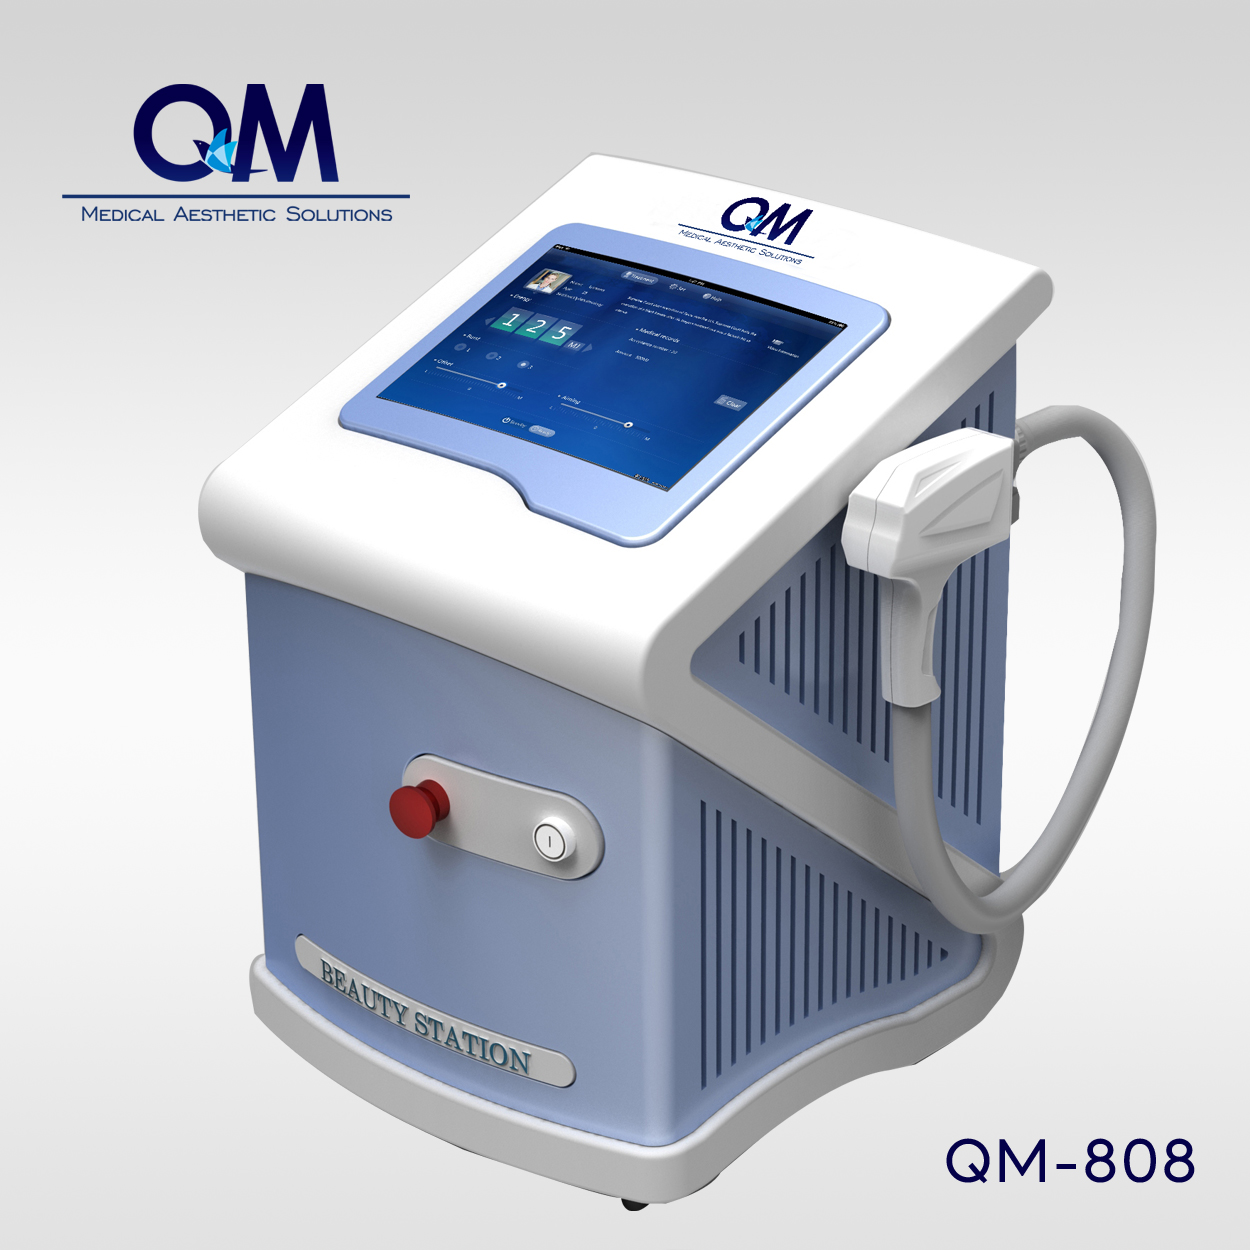 QM-808